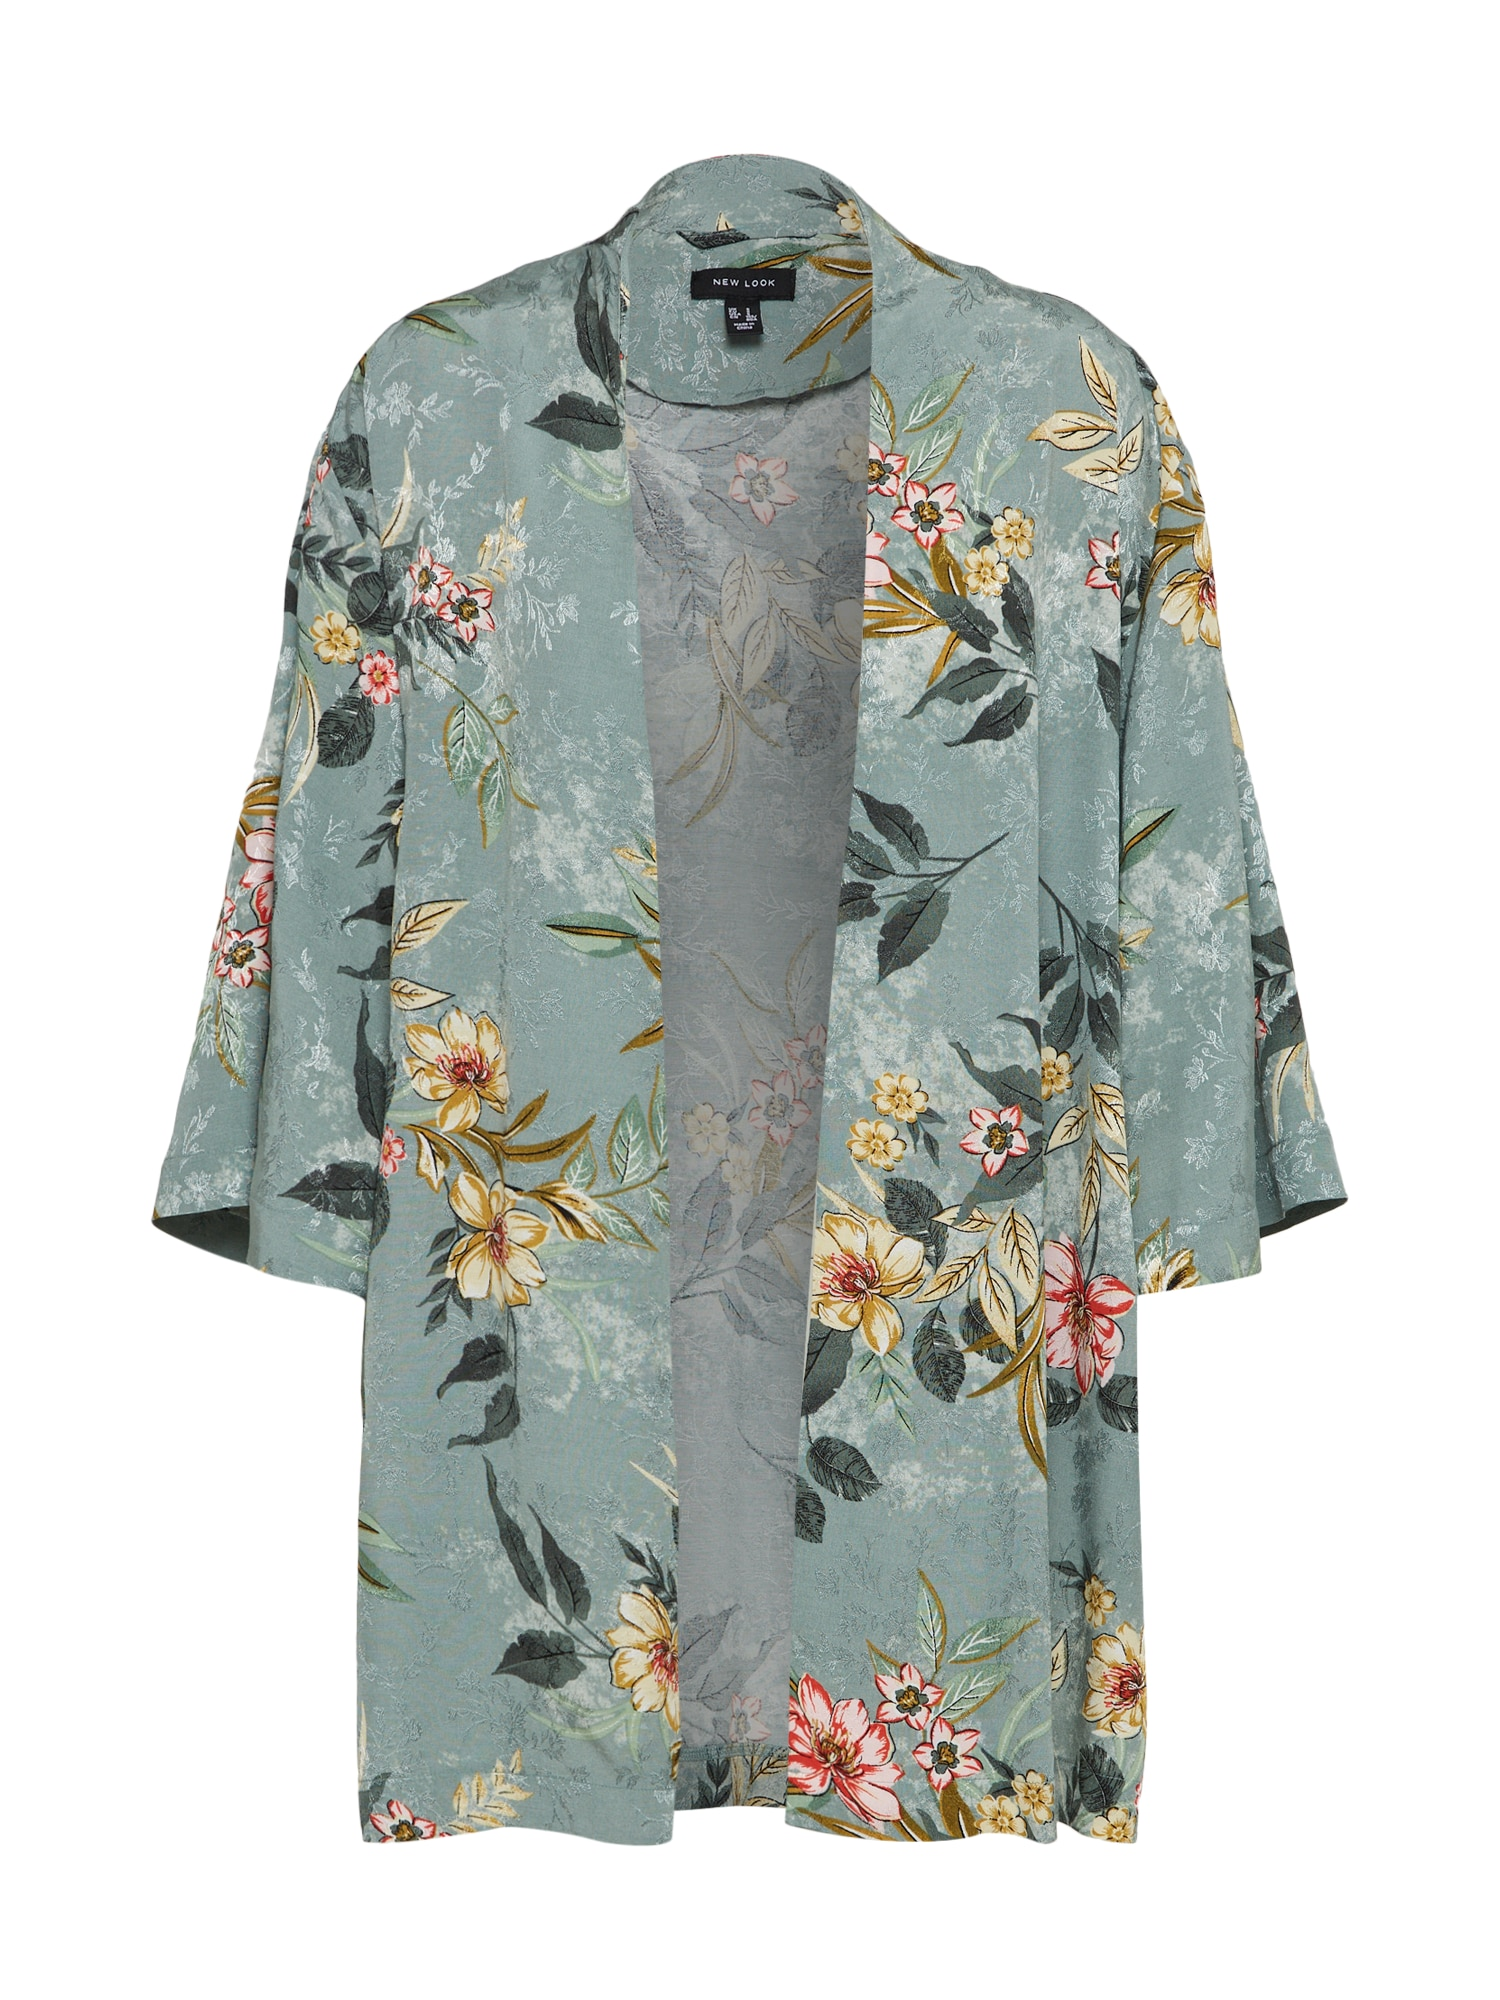 NEW LOOK, Dames Kimono, beige / mintgroen / donkergroen / rosa